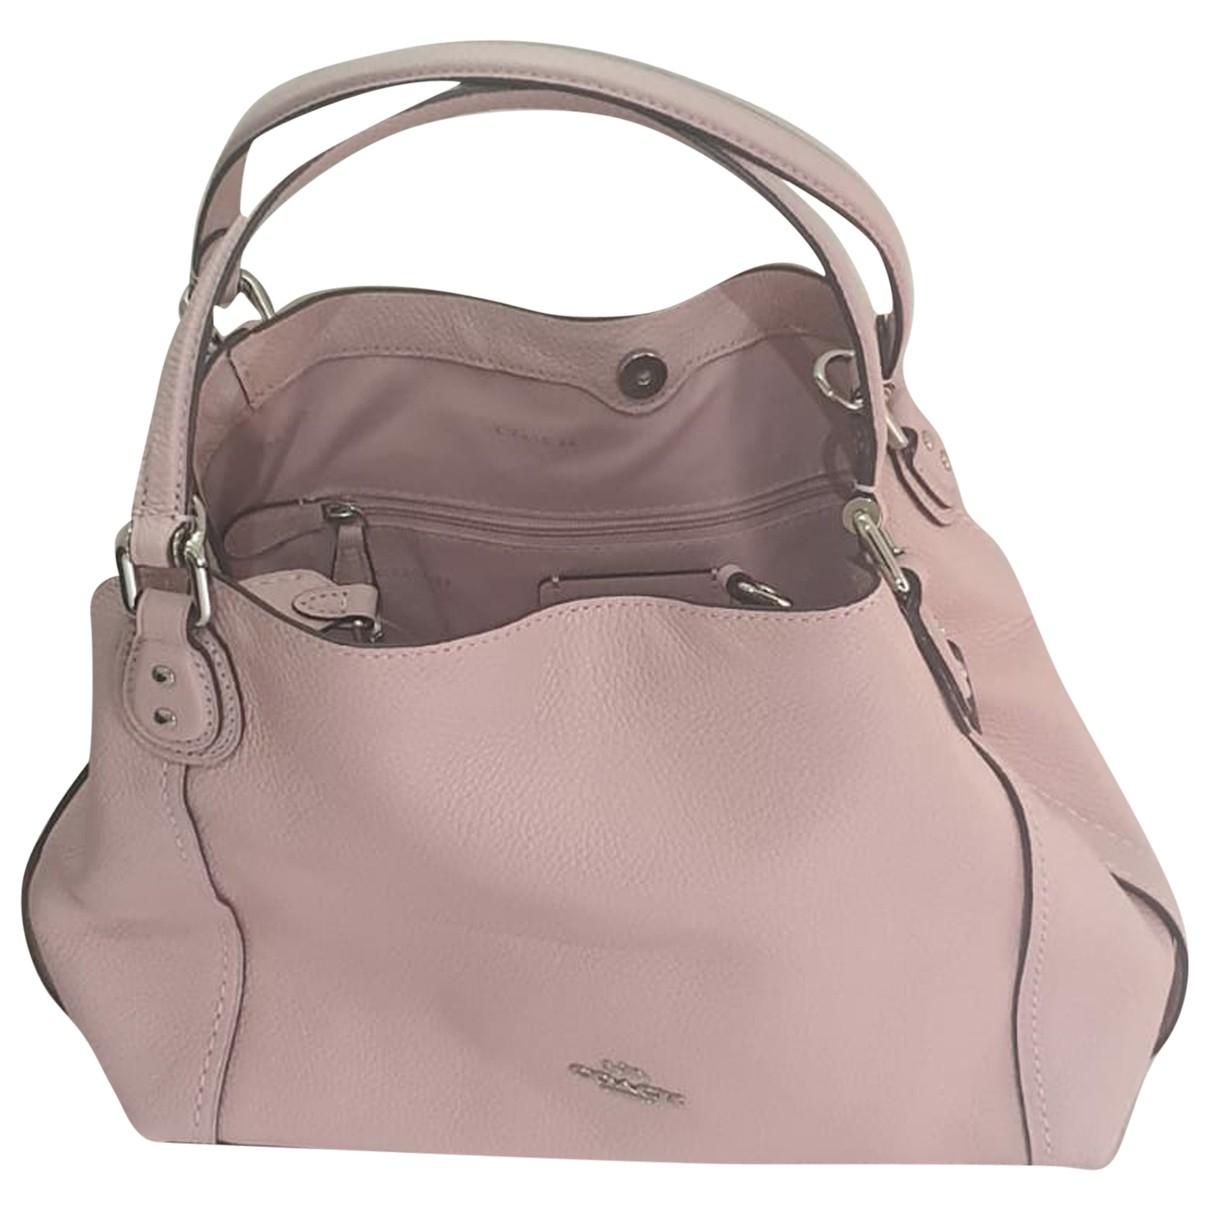 Coach Edie Pink Leather handbag for Women N